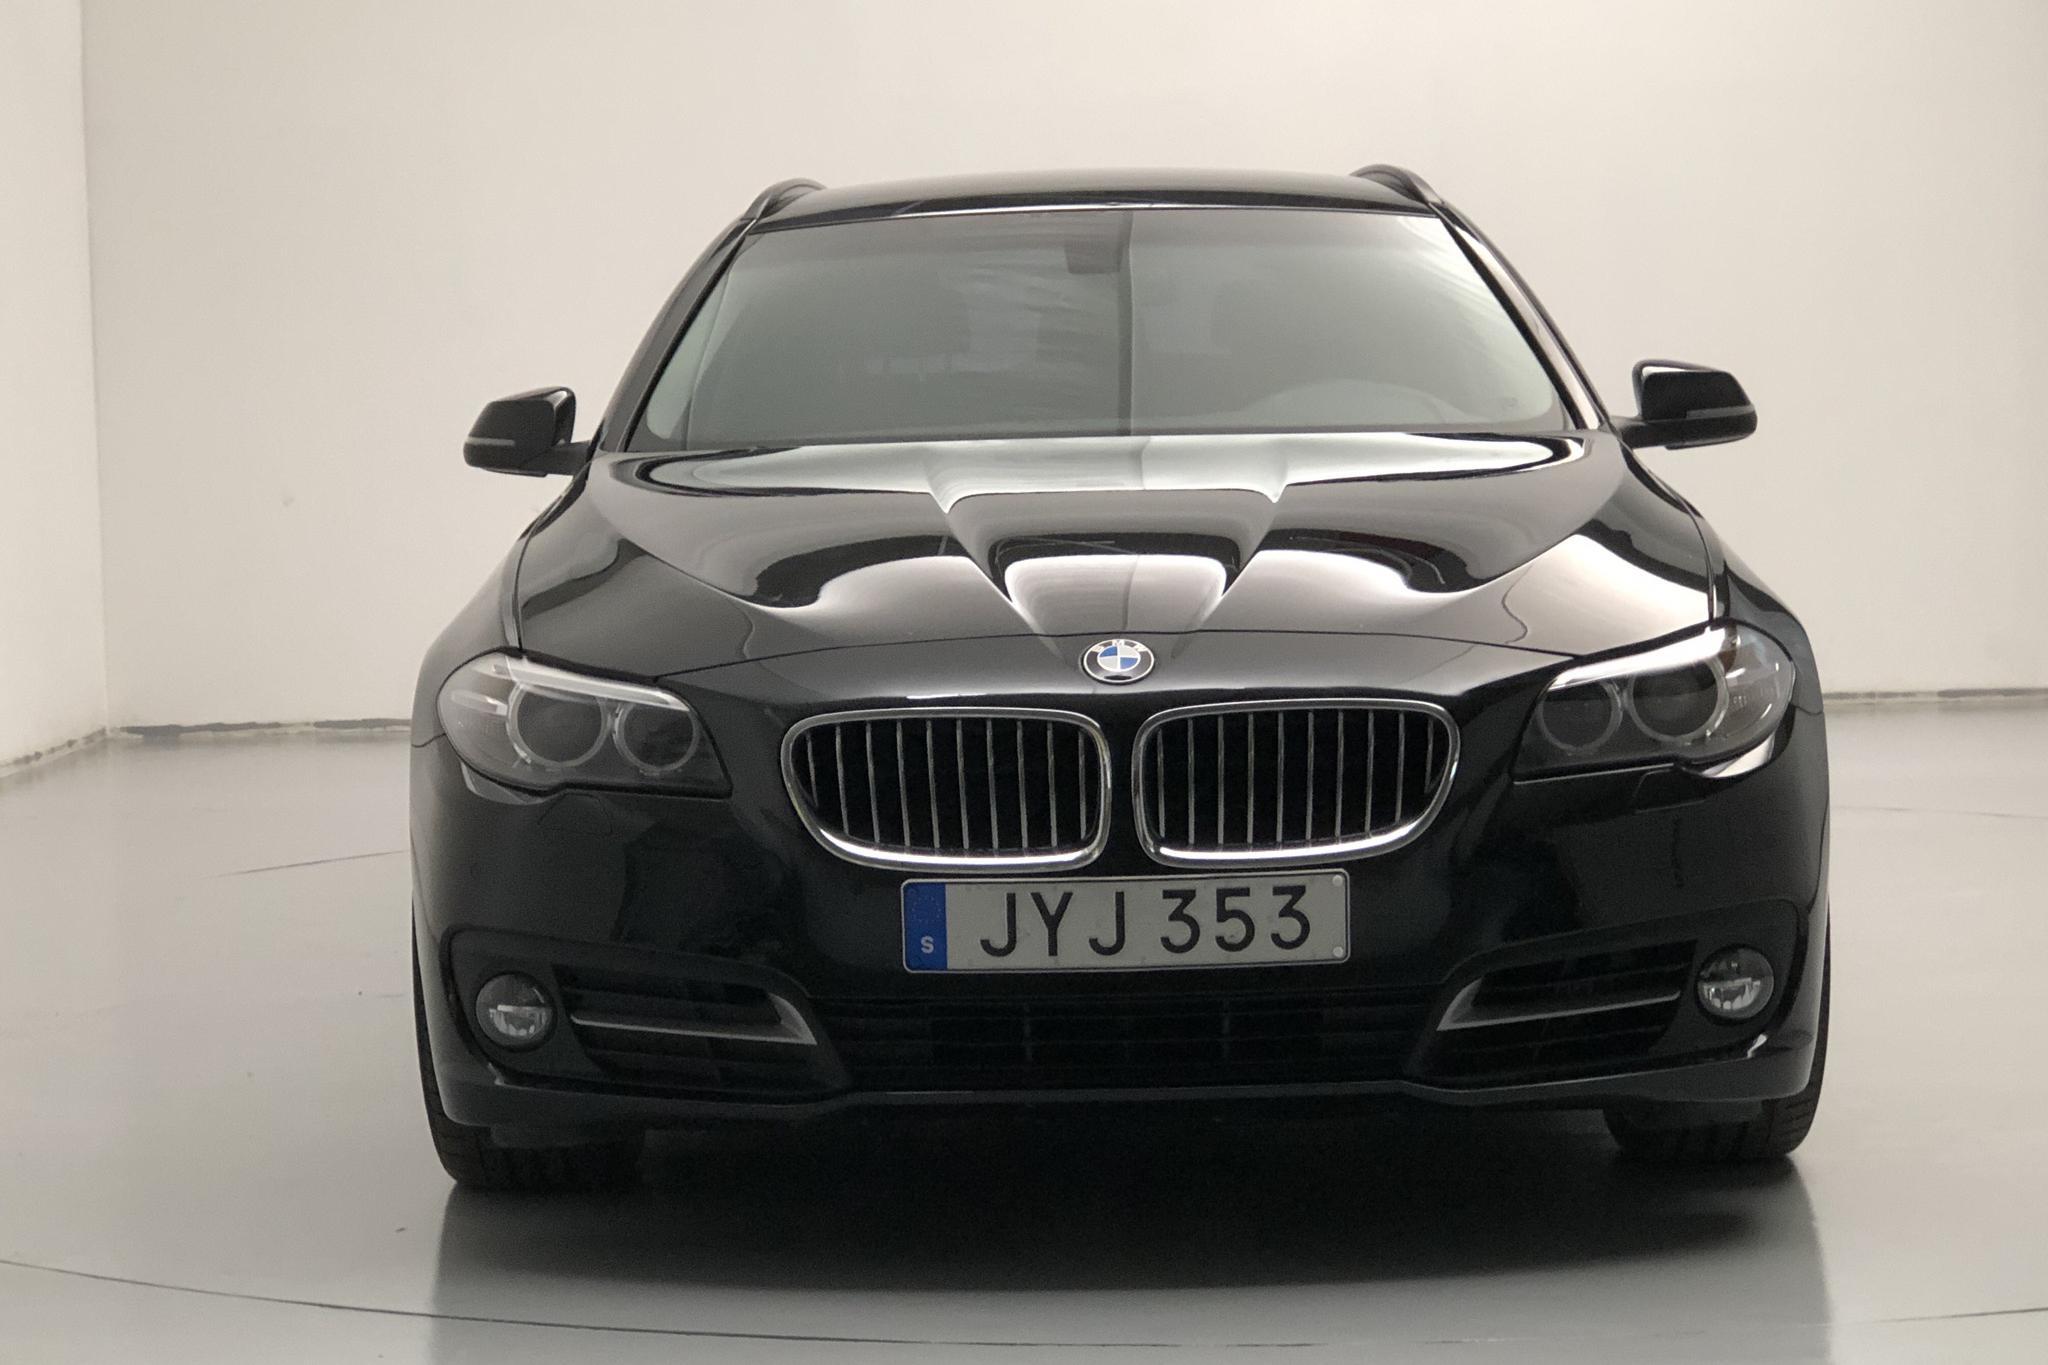 BMW 520d xDrive Touring, F11 (190hk) - 7 585 mil - Automat - svart - 2016